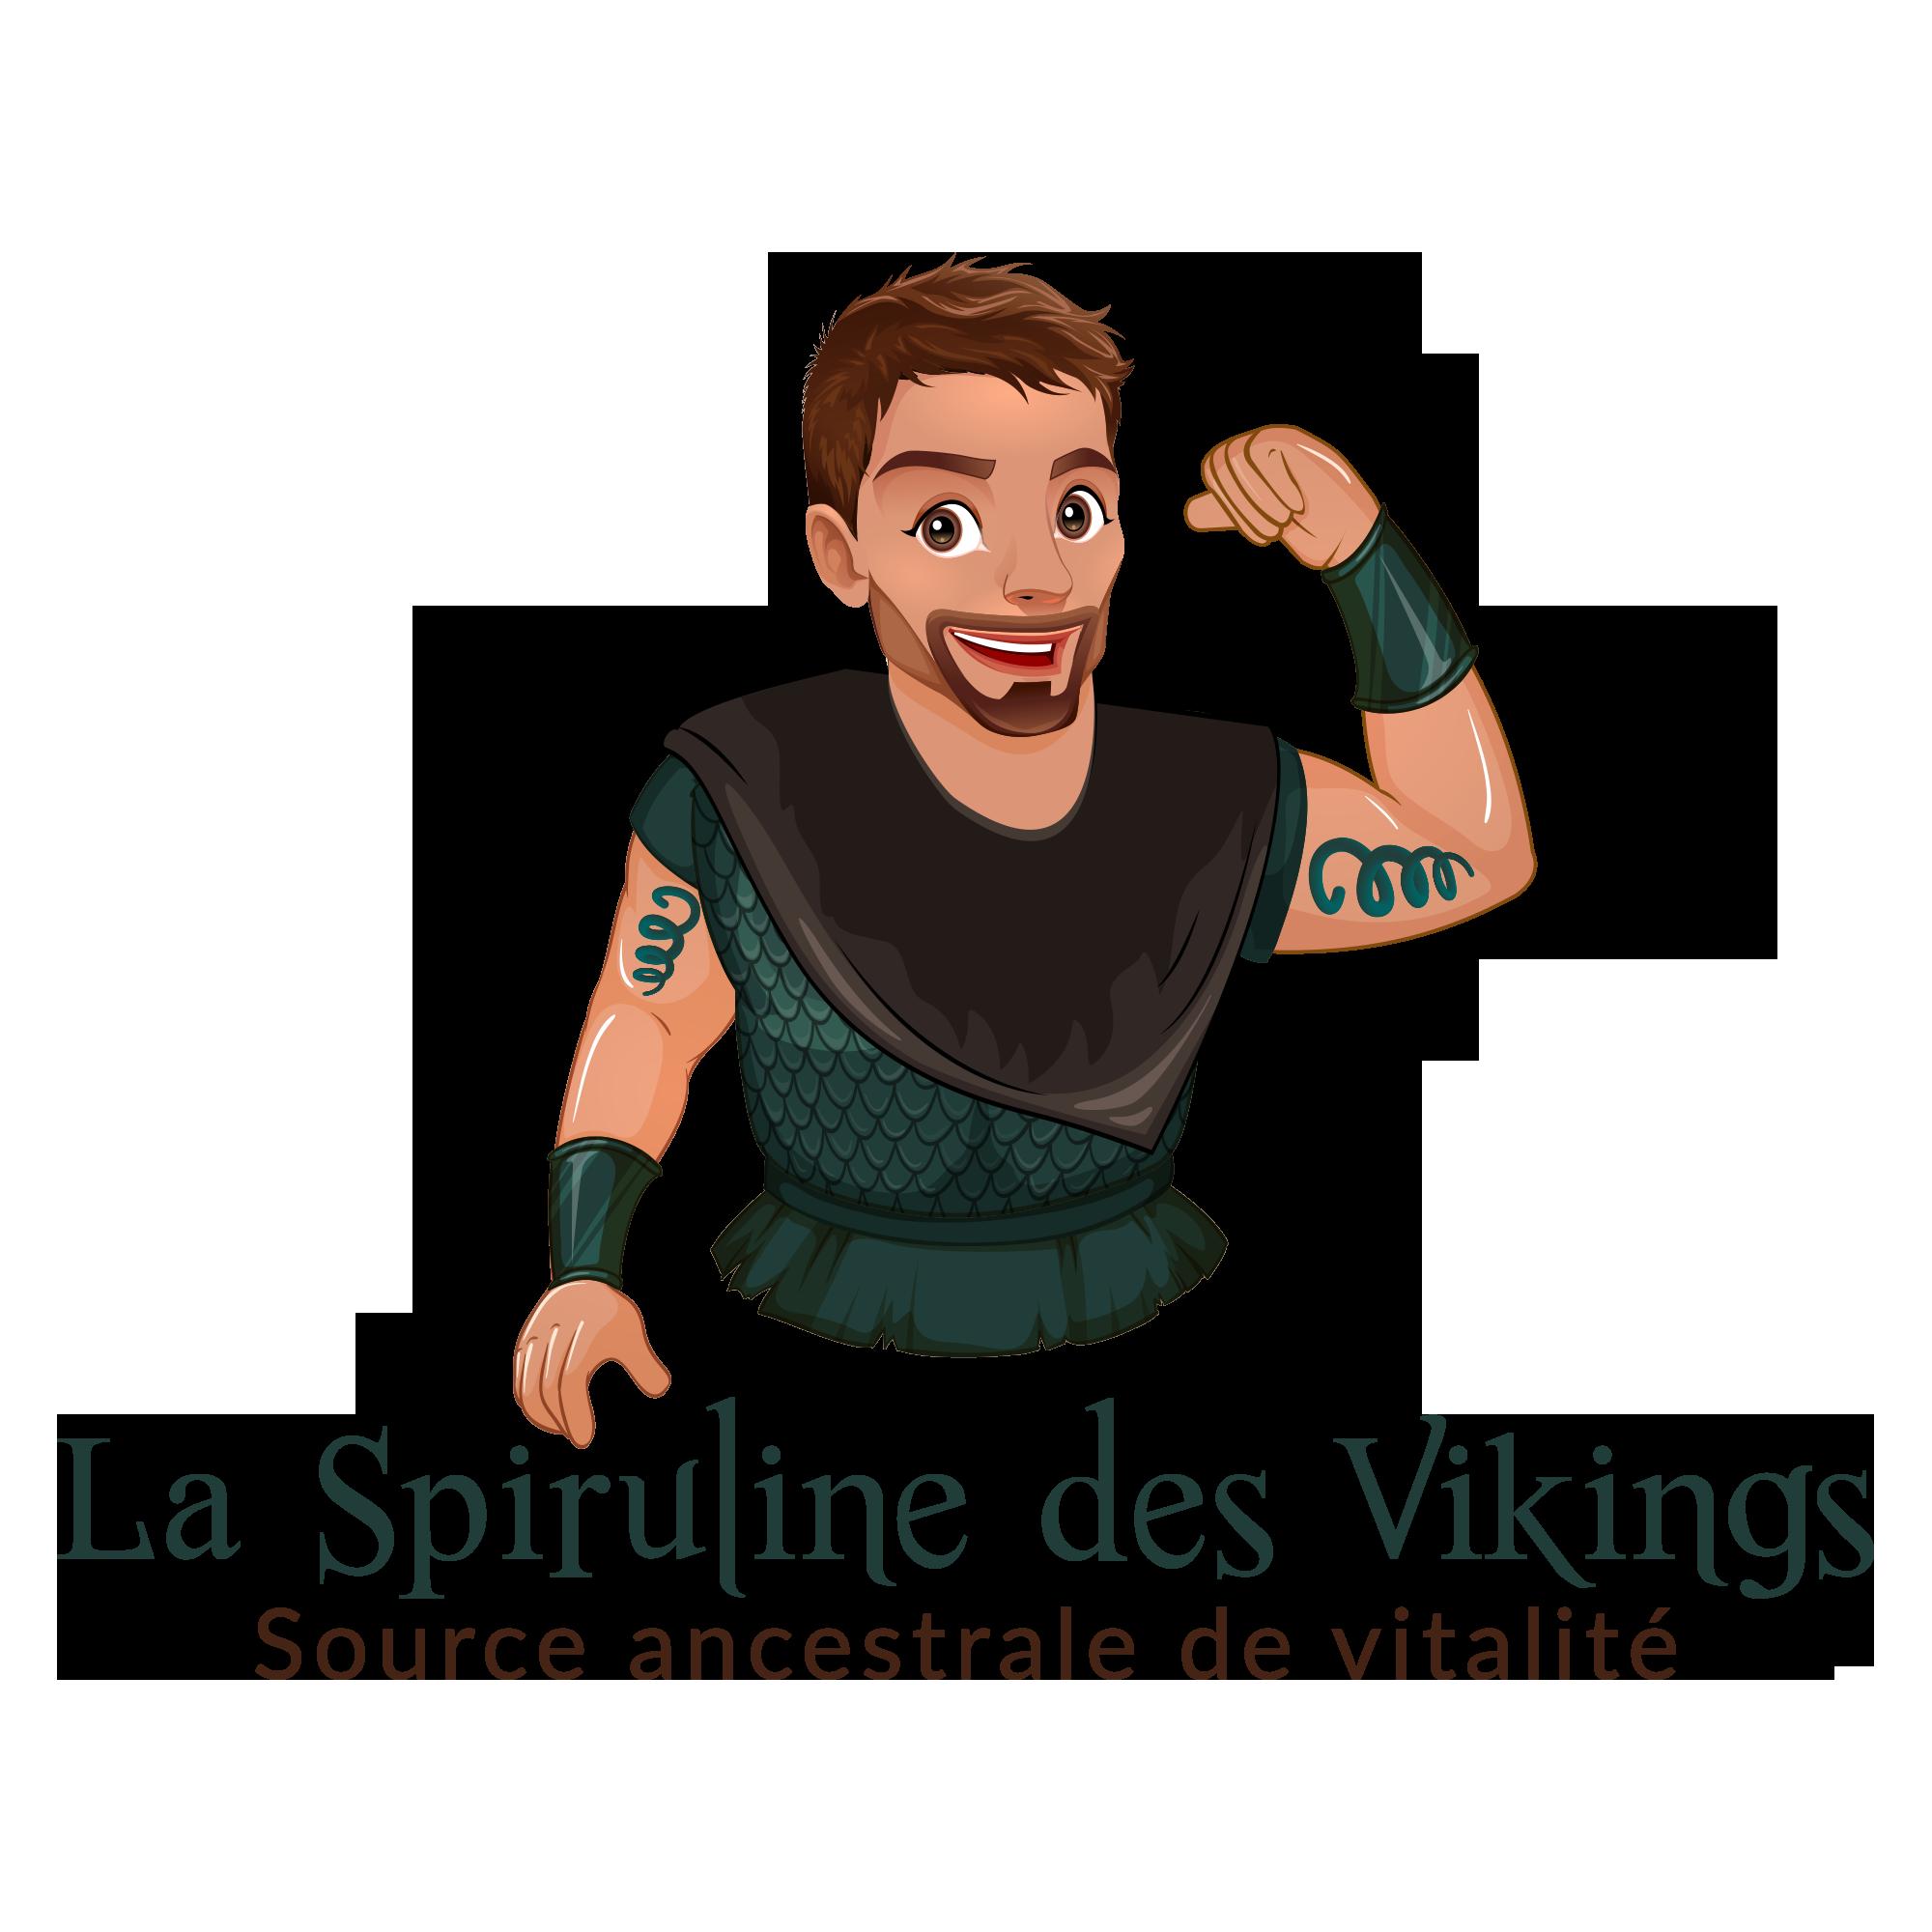 La Spiruline des Vikings